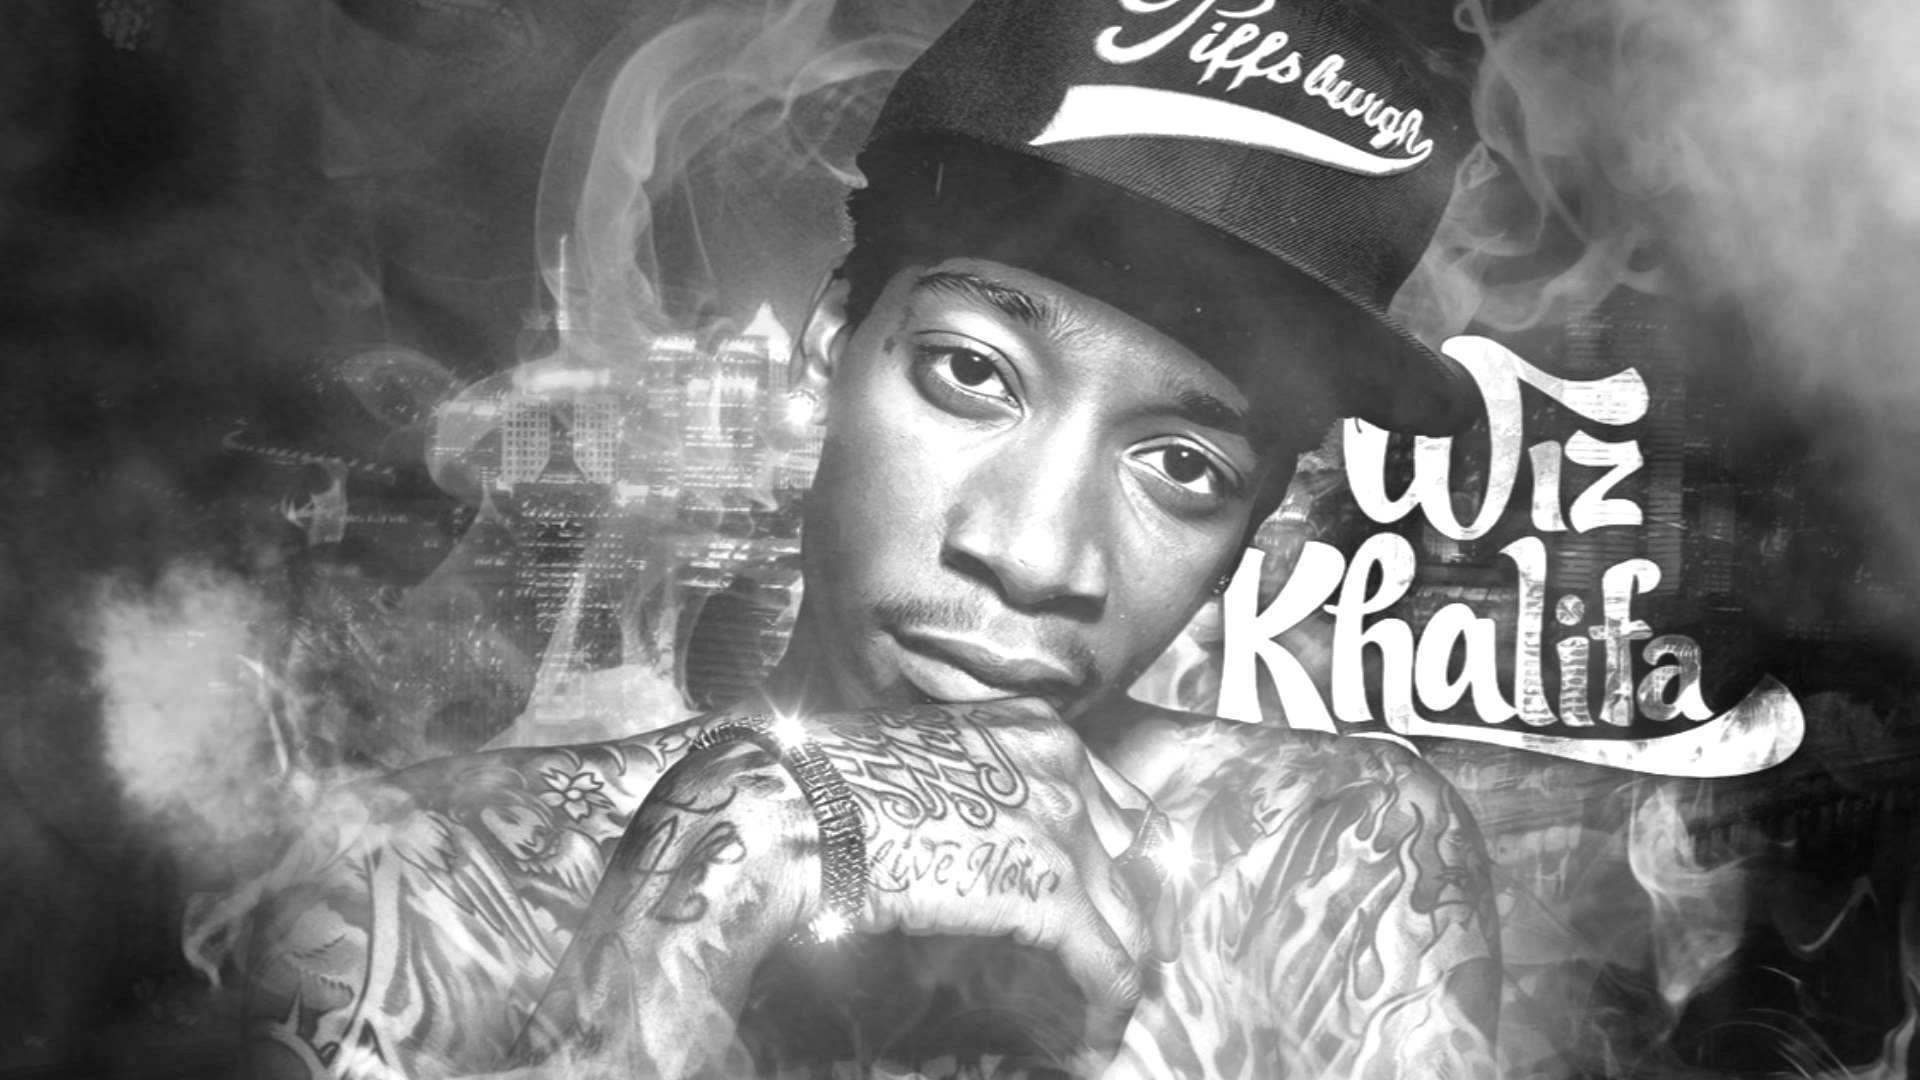 63 Best Free Wiz Khalifa Album Wallpapers